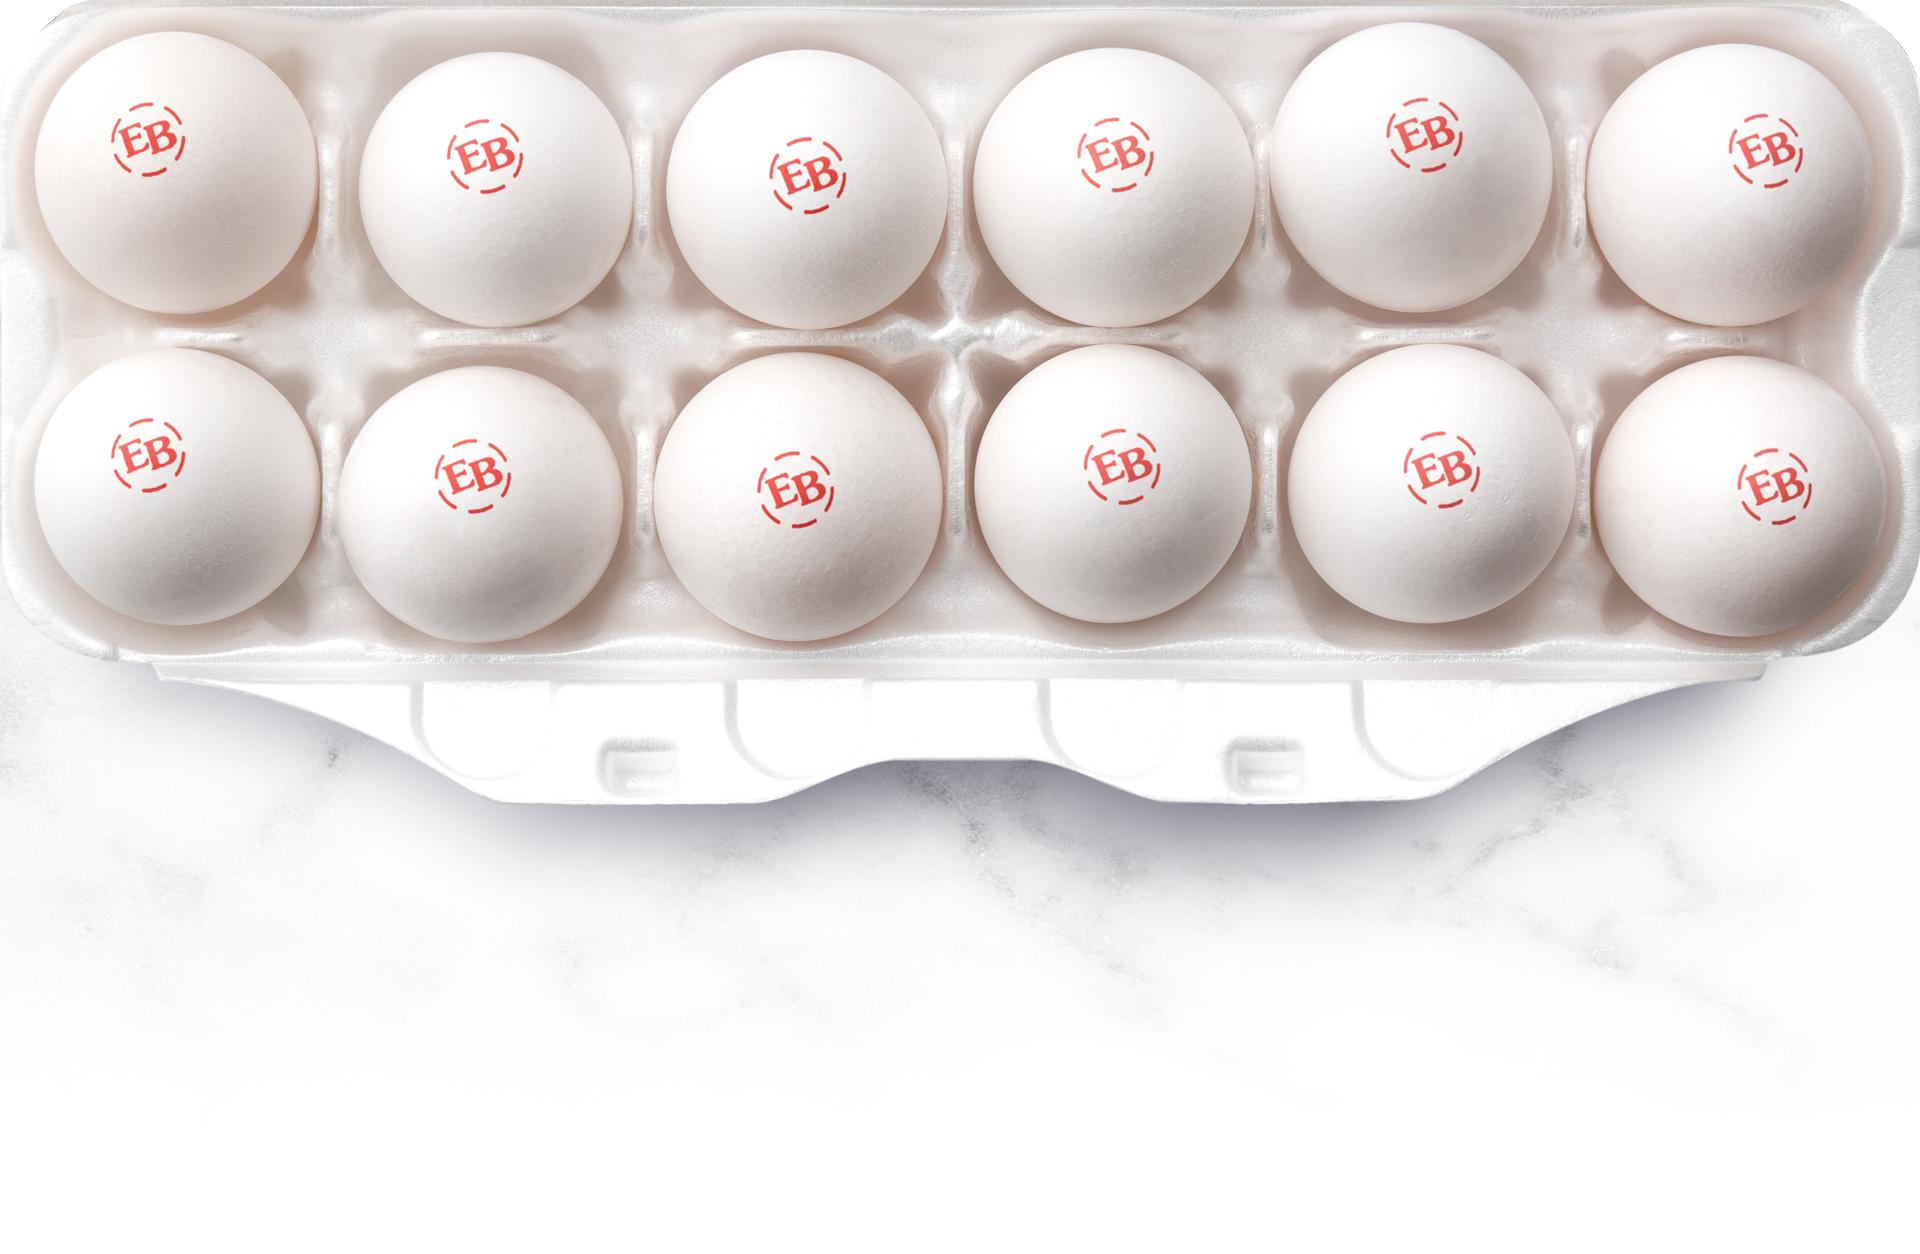 A carton of Eggland's Best Eggs